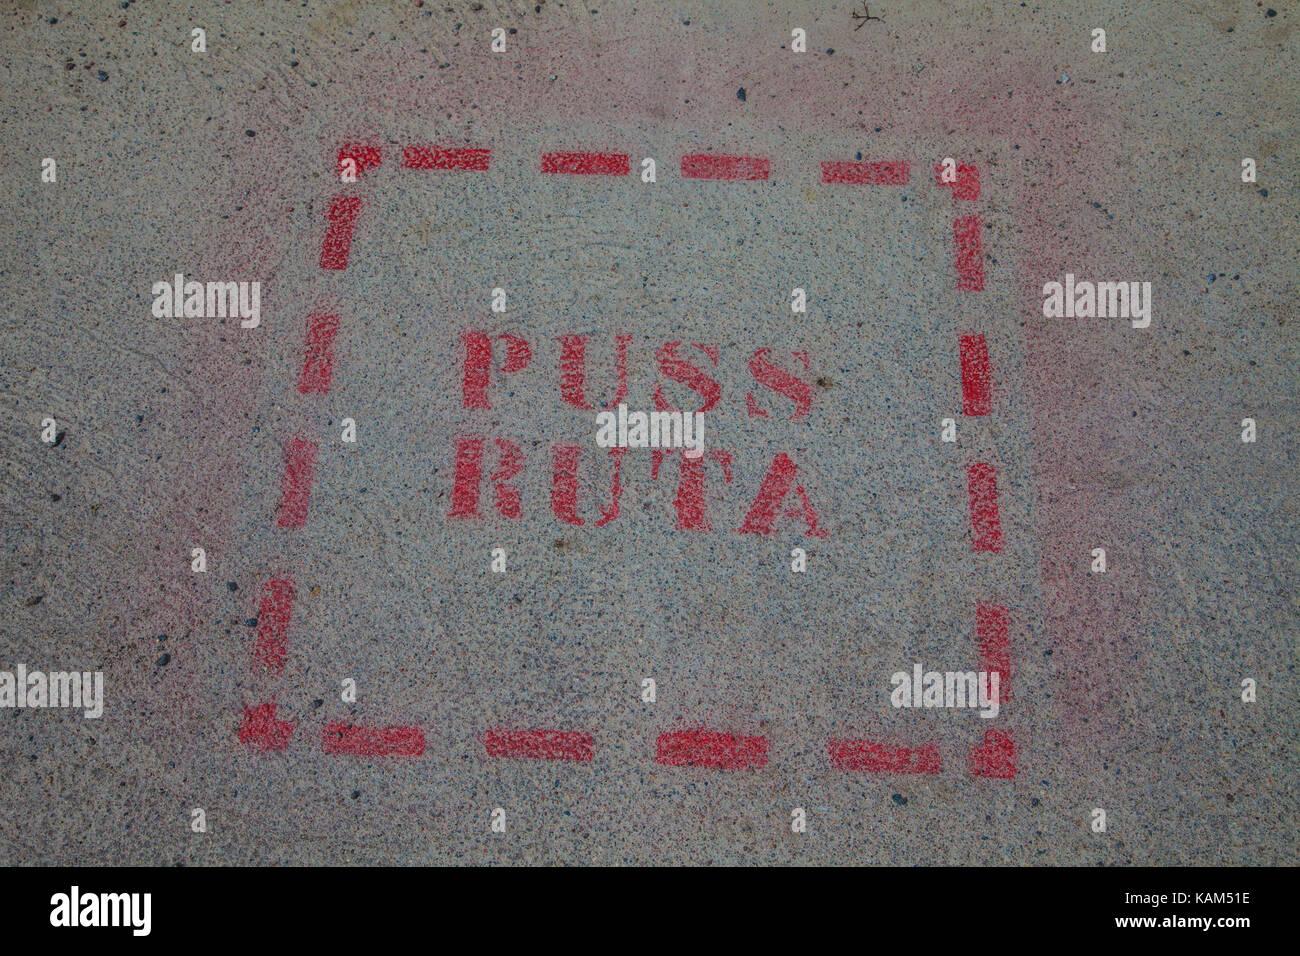 Pussruta/Küssen box Stockbild